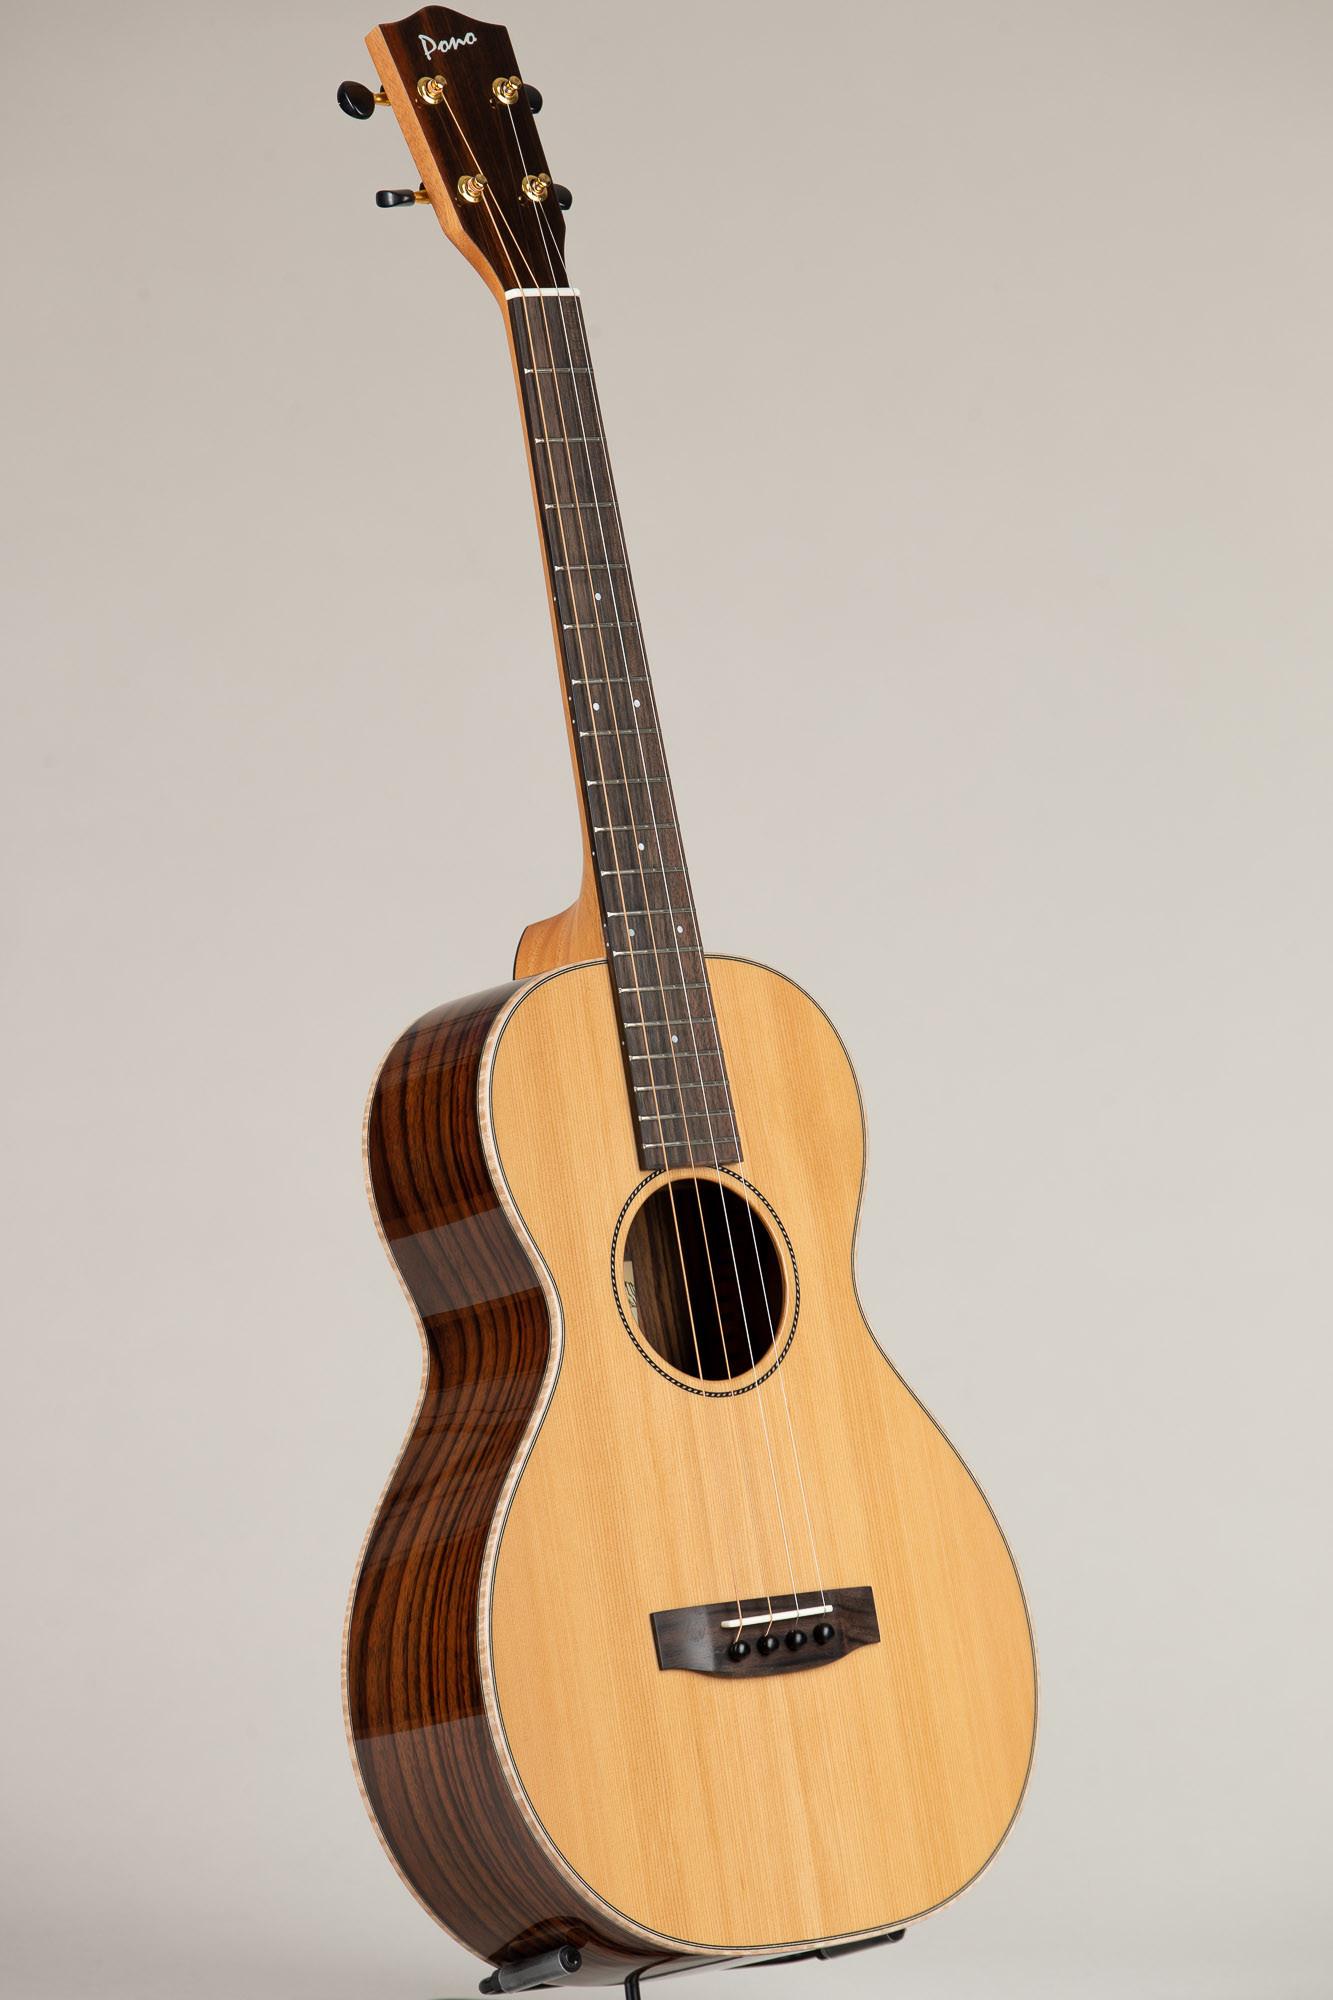 Pono Cedar Rosewood Steel String Baritone (UL4-4 4541)